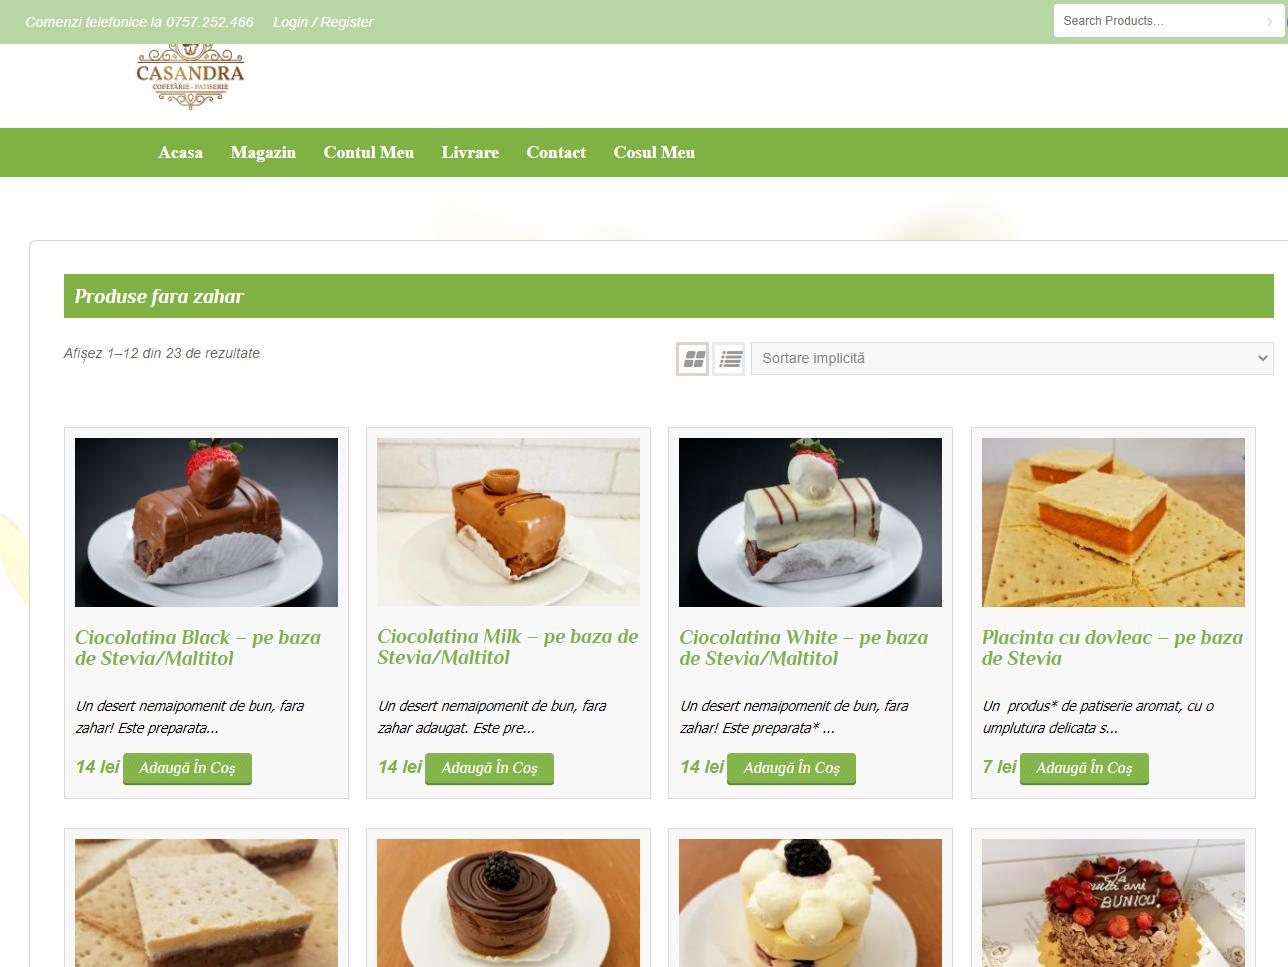 casandra web page